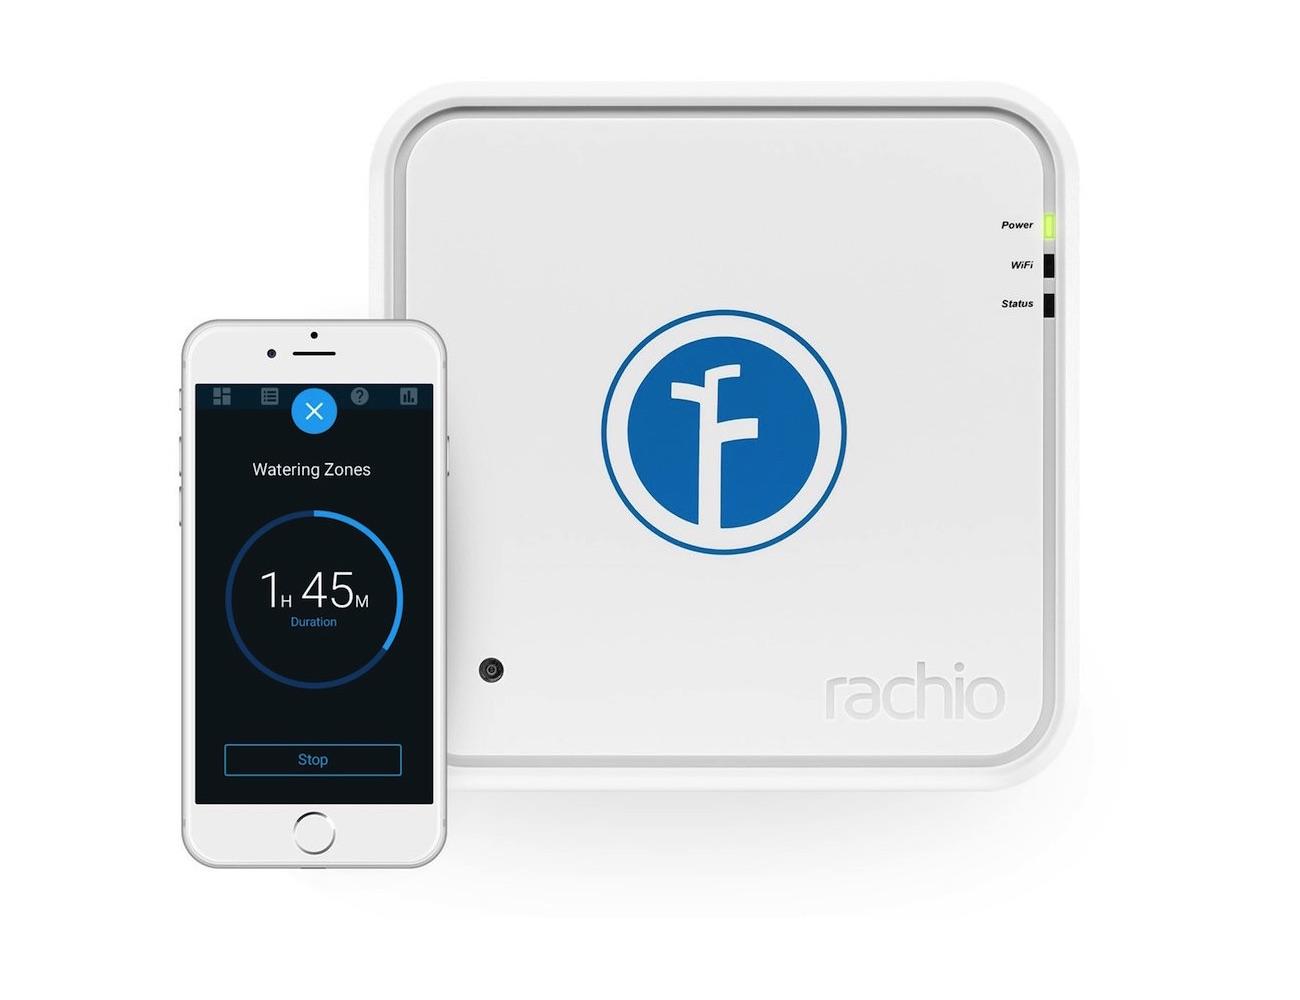 Rachio IRO – Smart Wifi Enabled Irrigation Controller